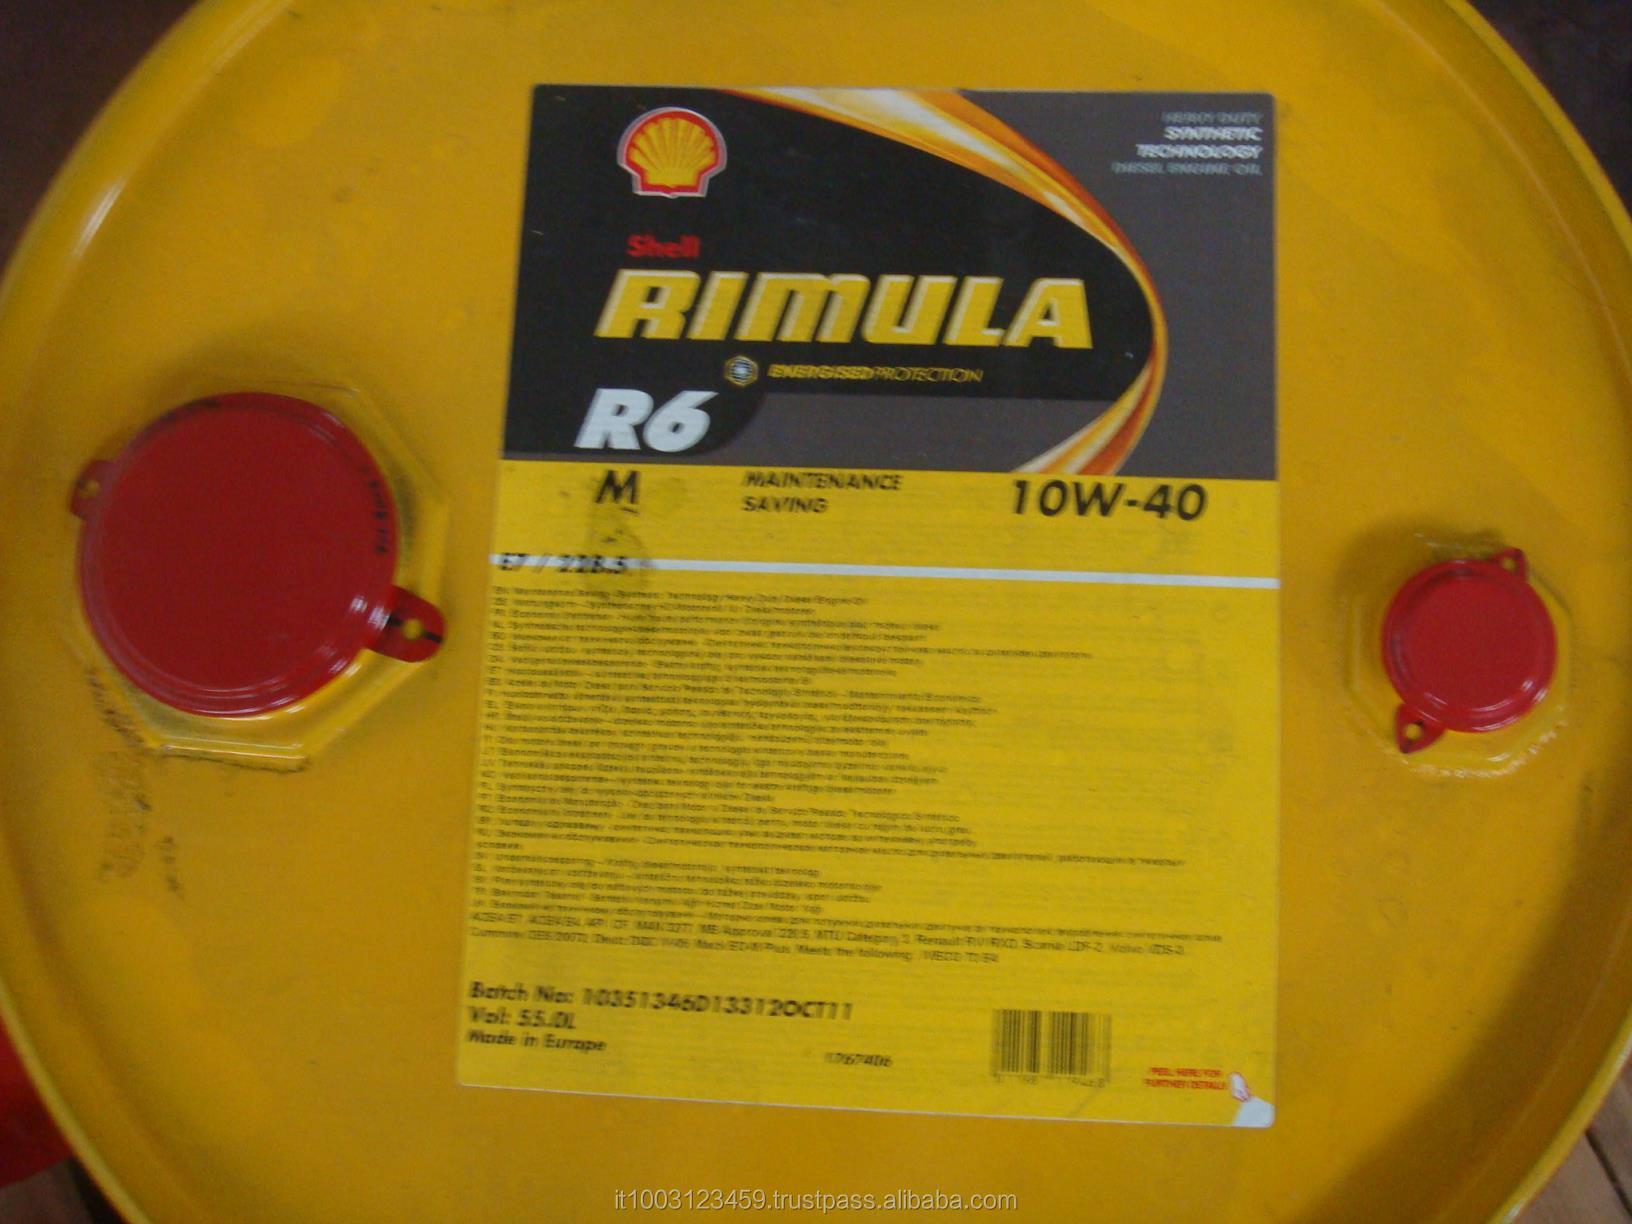 Shell Rimula R6M 10W 40